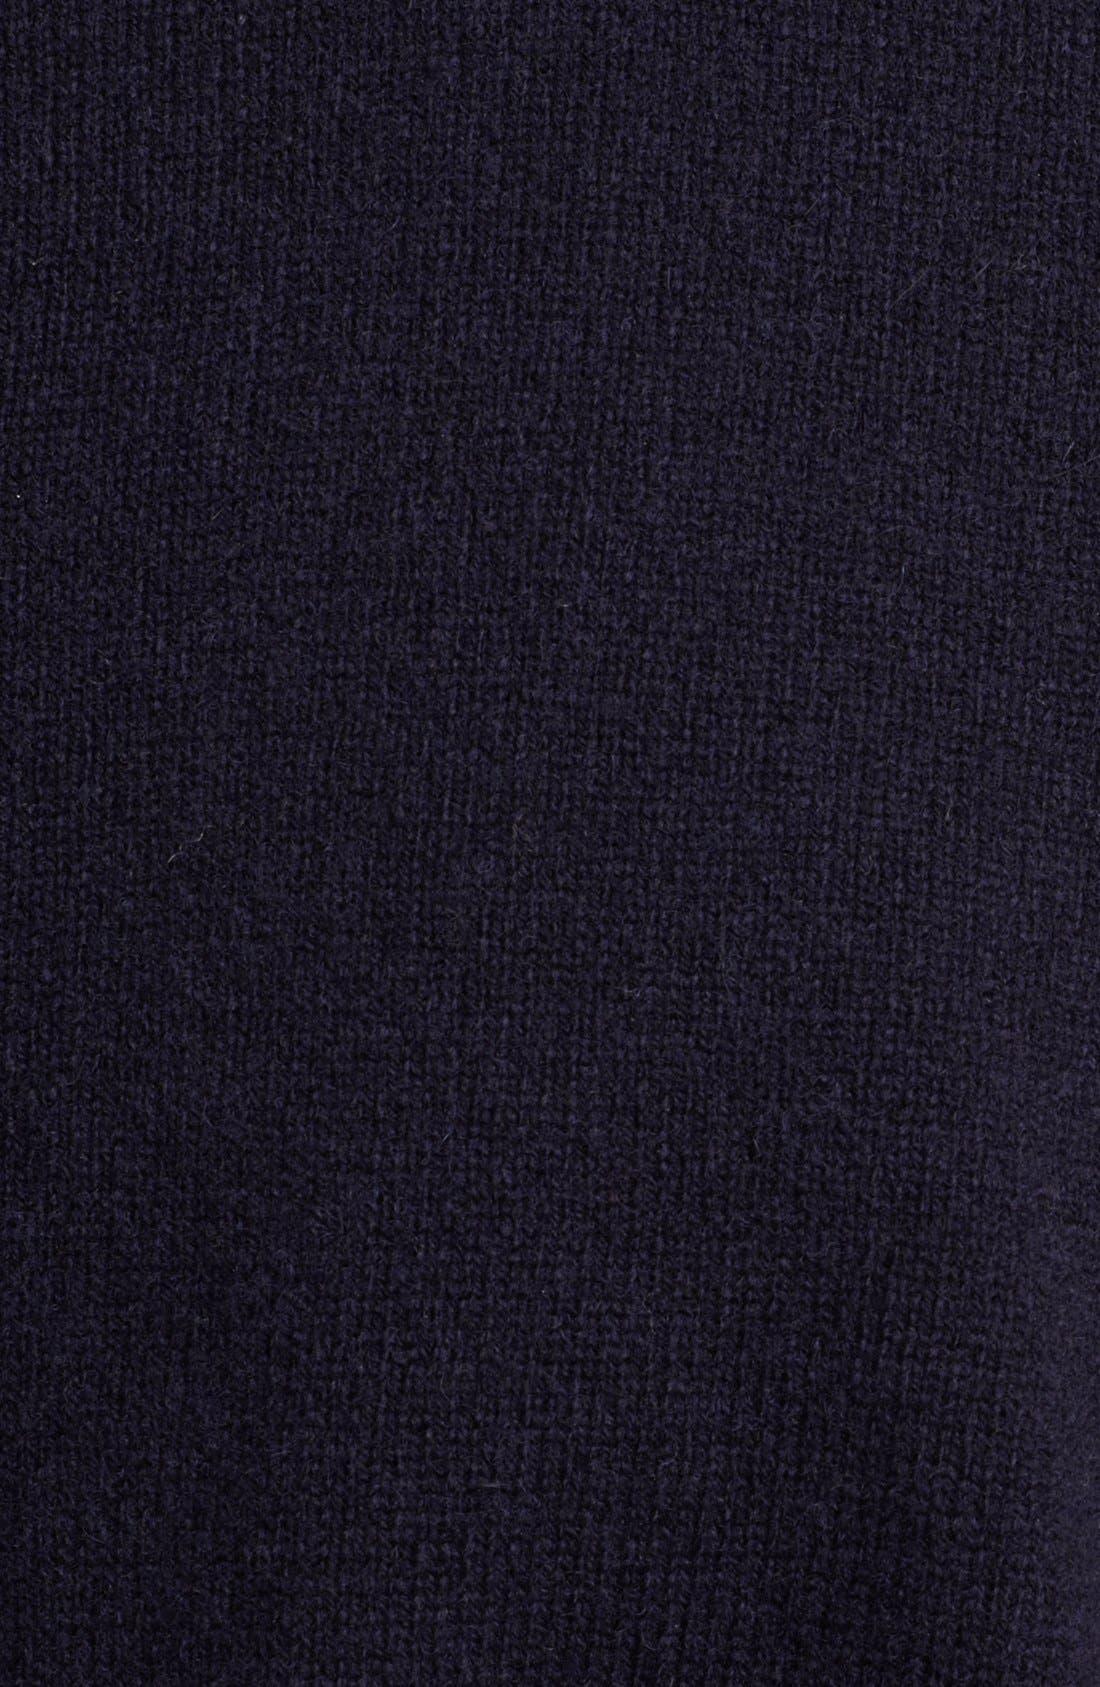 Alternate Image 3  - MARC JACOBS Jewel Embroidered Cardigan